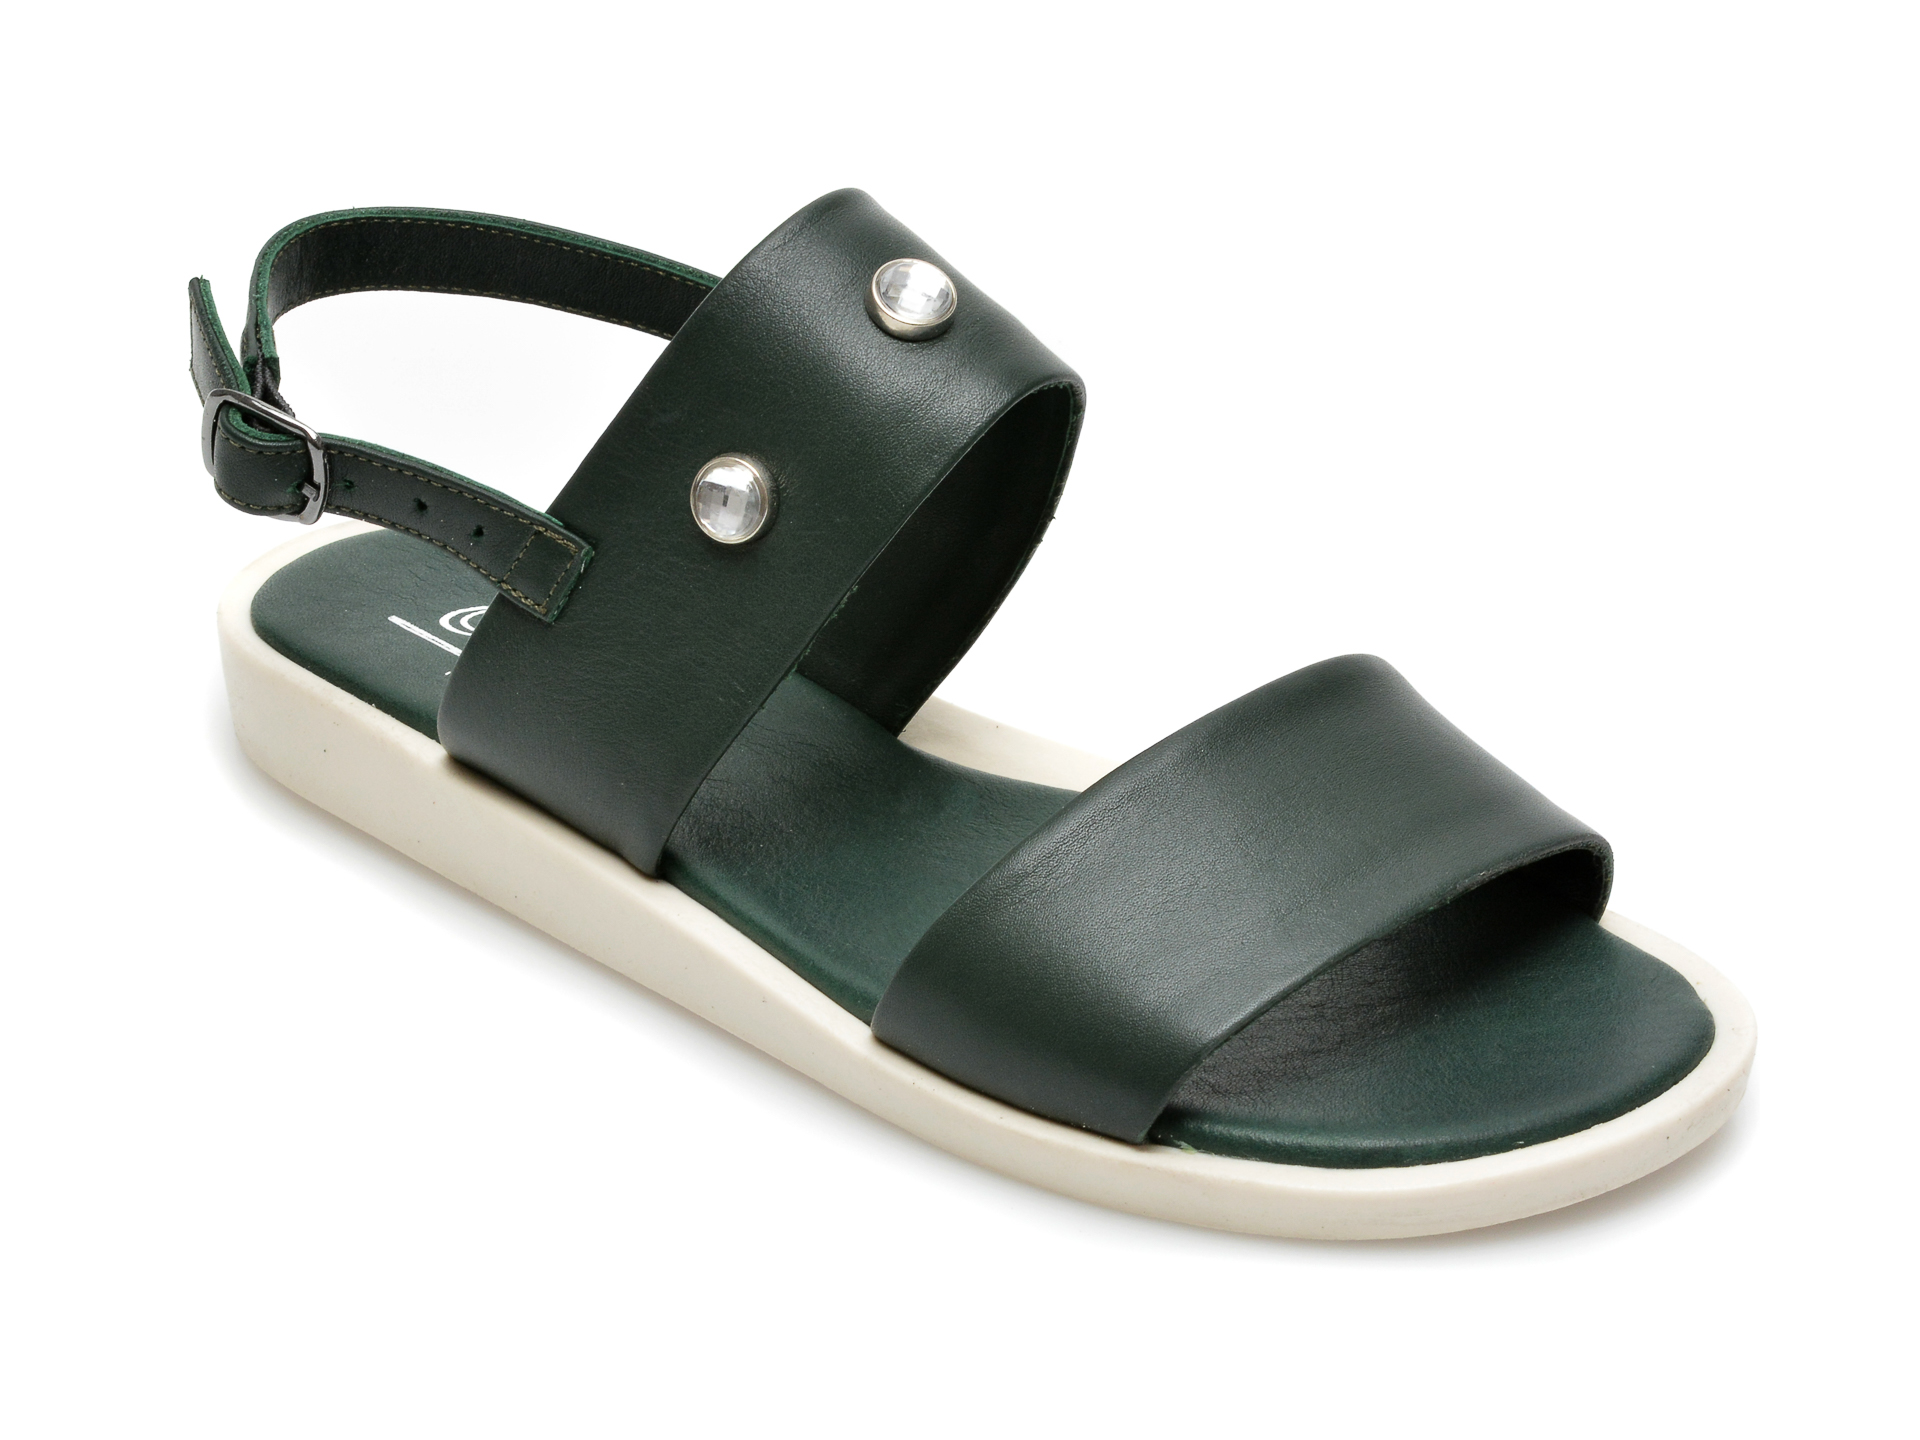 Sandale SHADE verzi, 2526, din piele naturala imagine otter.ro 2021